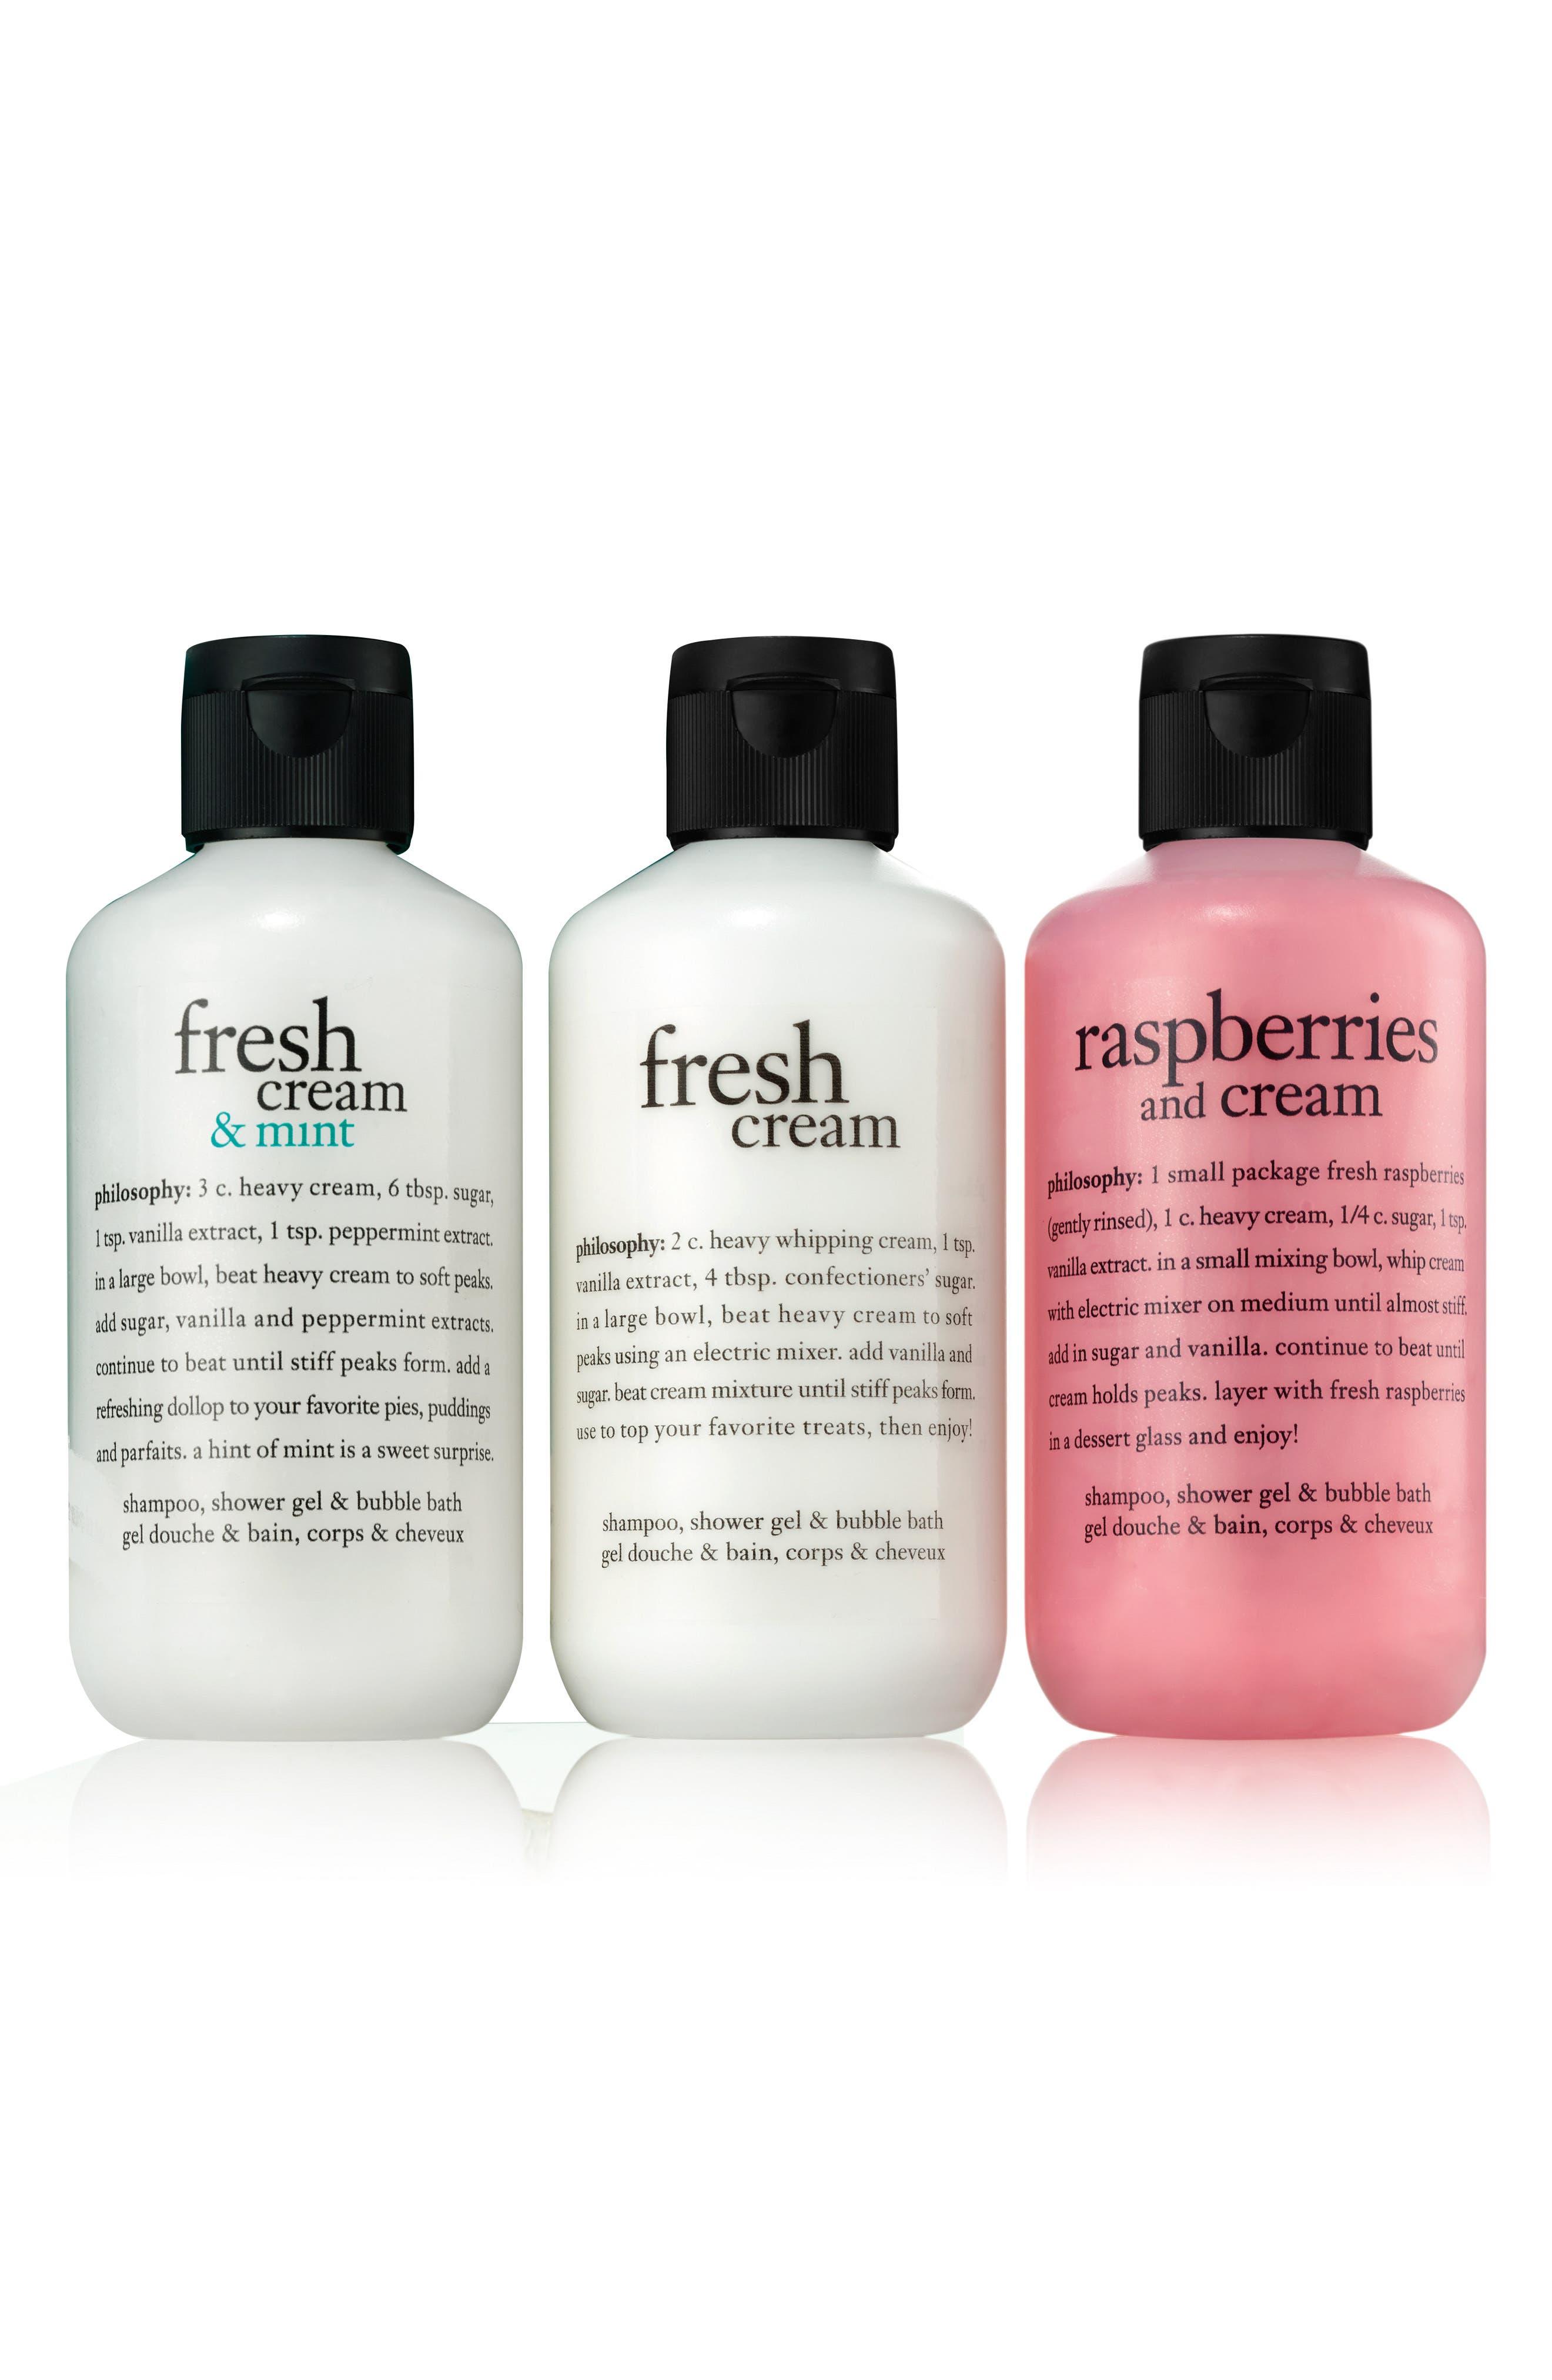 Alternate Image 1 Selected - philosophy fresh cream shampoo, shower gel & bubble bath trio